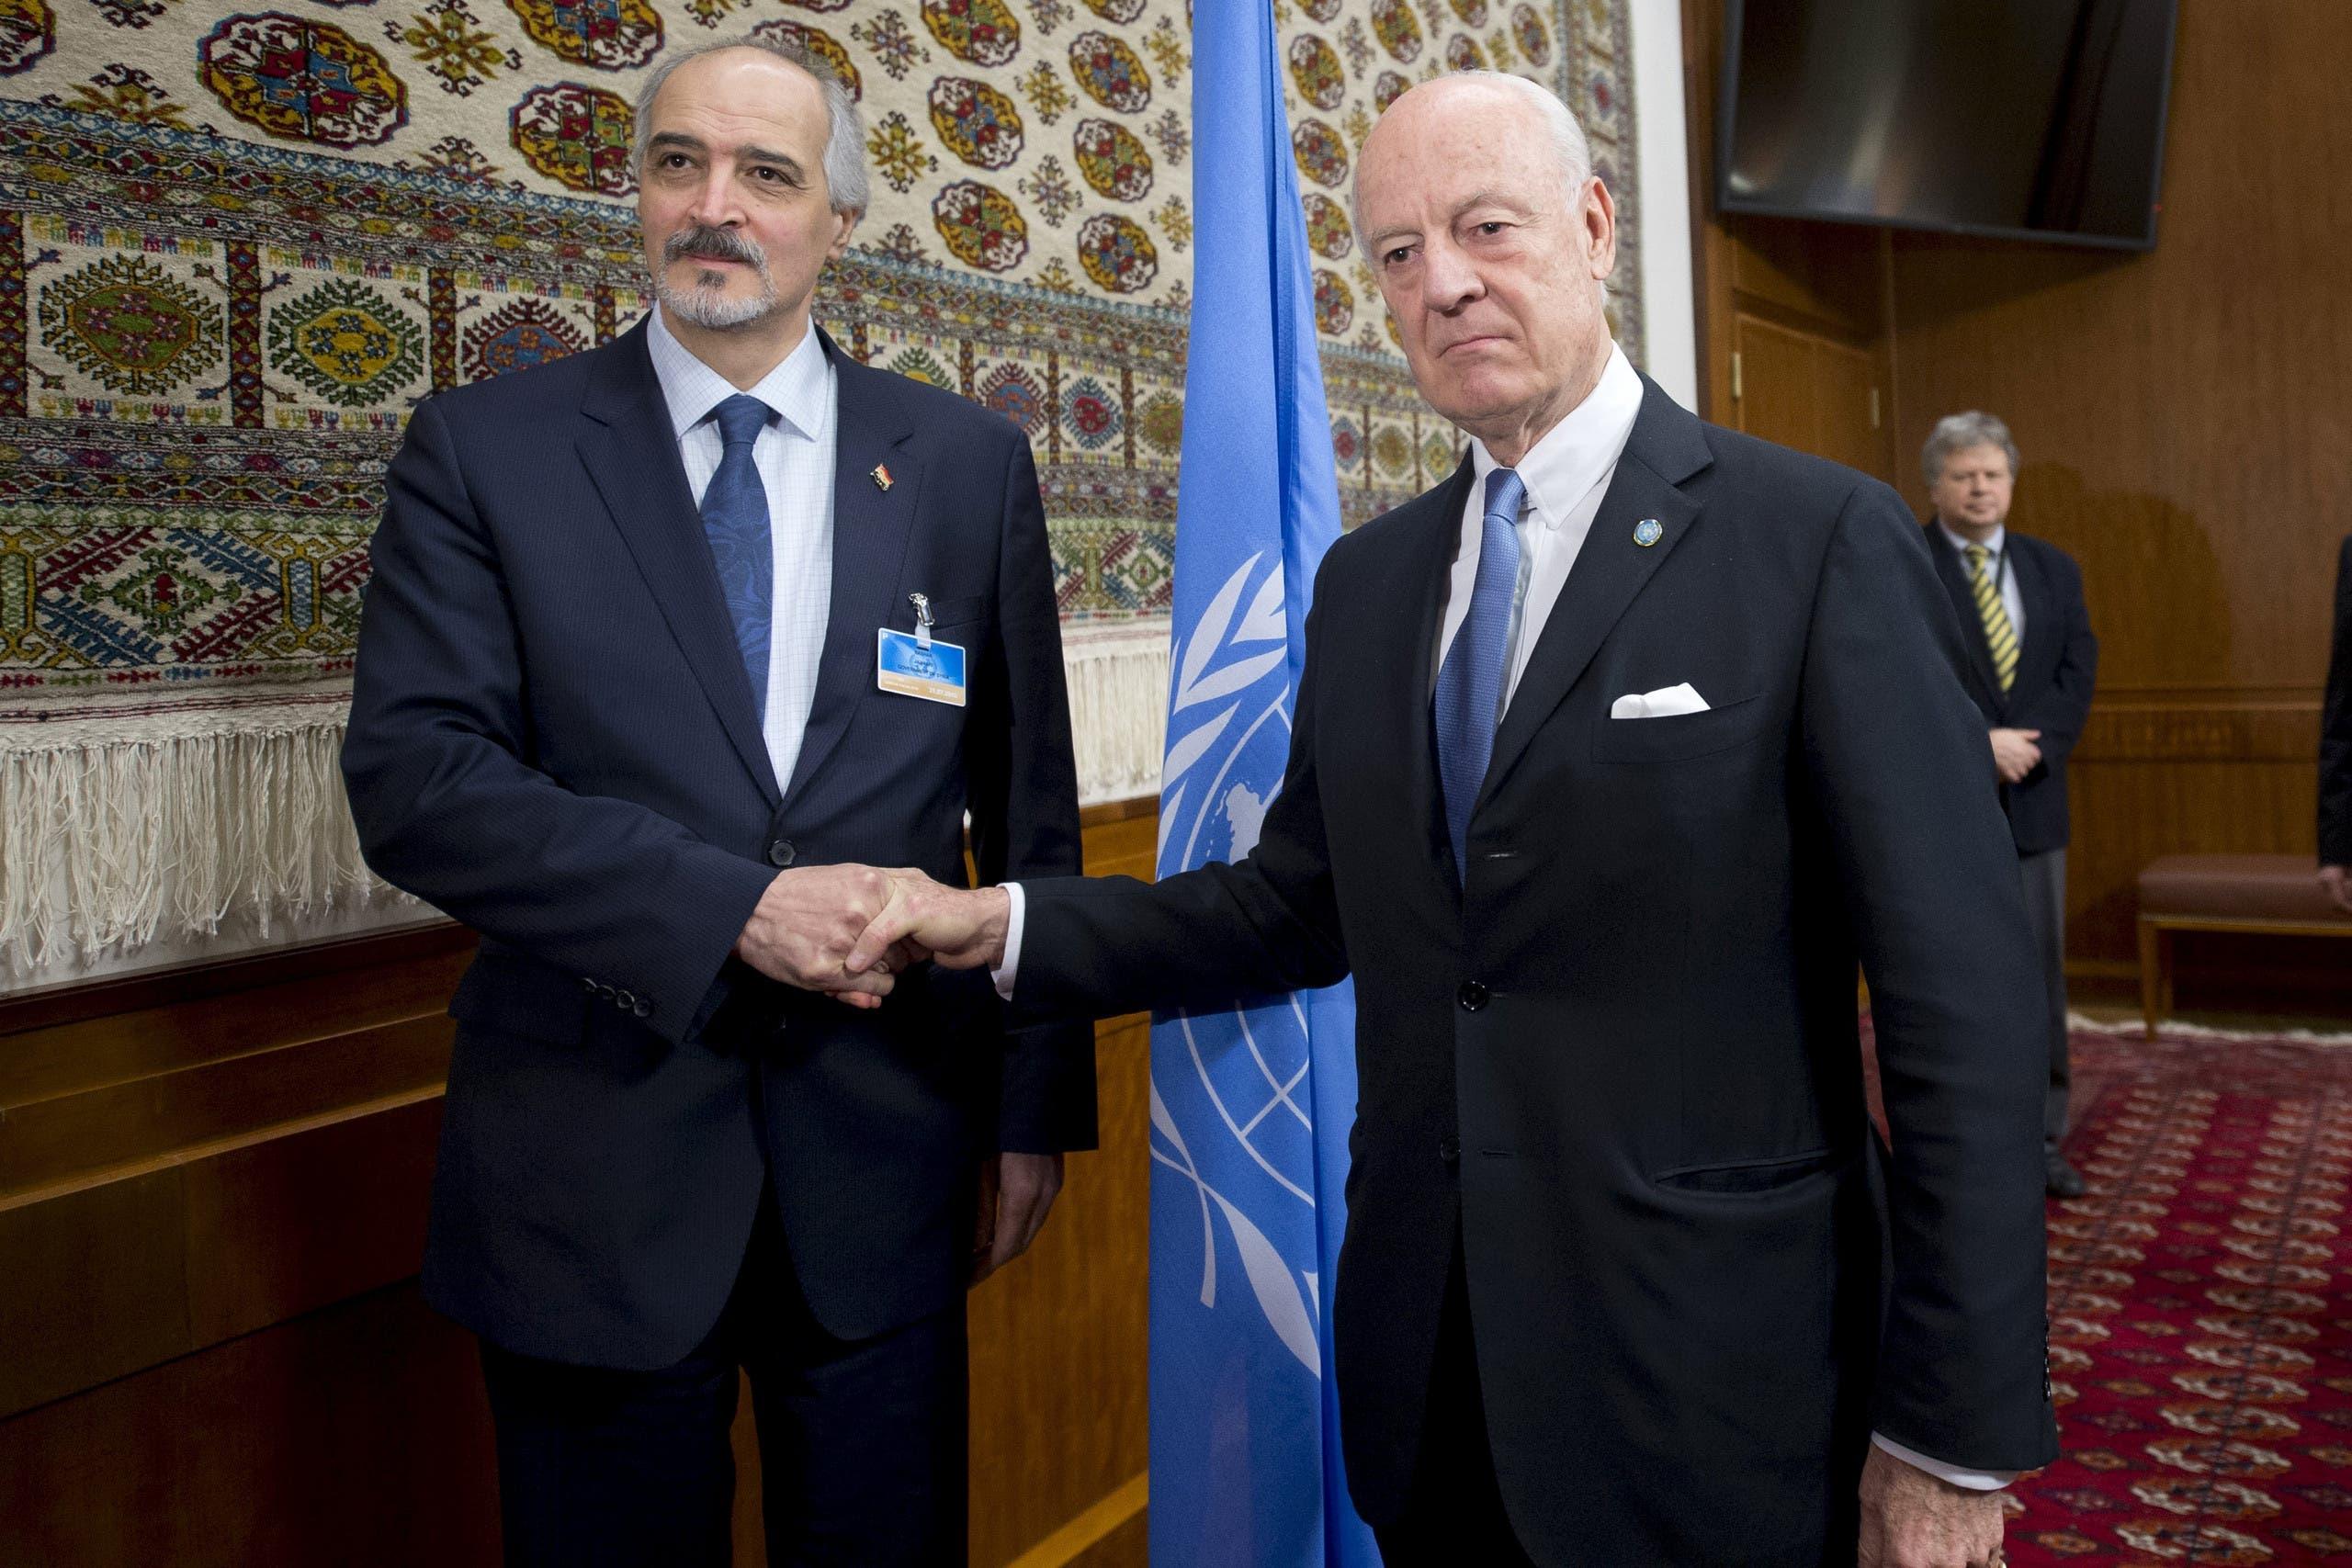 U.N. envoy Staffan de Mistura shakes hands with Syria's Ambassador to the United Nations Bashar al Jaafari (L) during the Syria peace talks in Geneva, Switzerland, January 29, 2016. (Reuters)